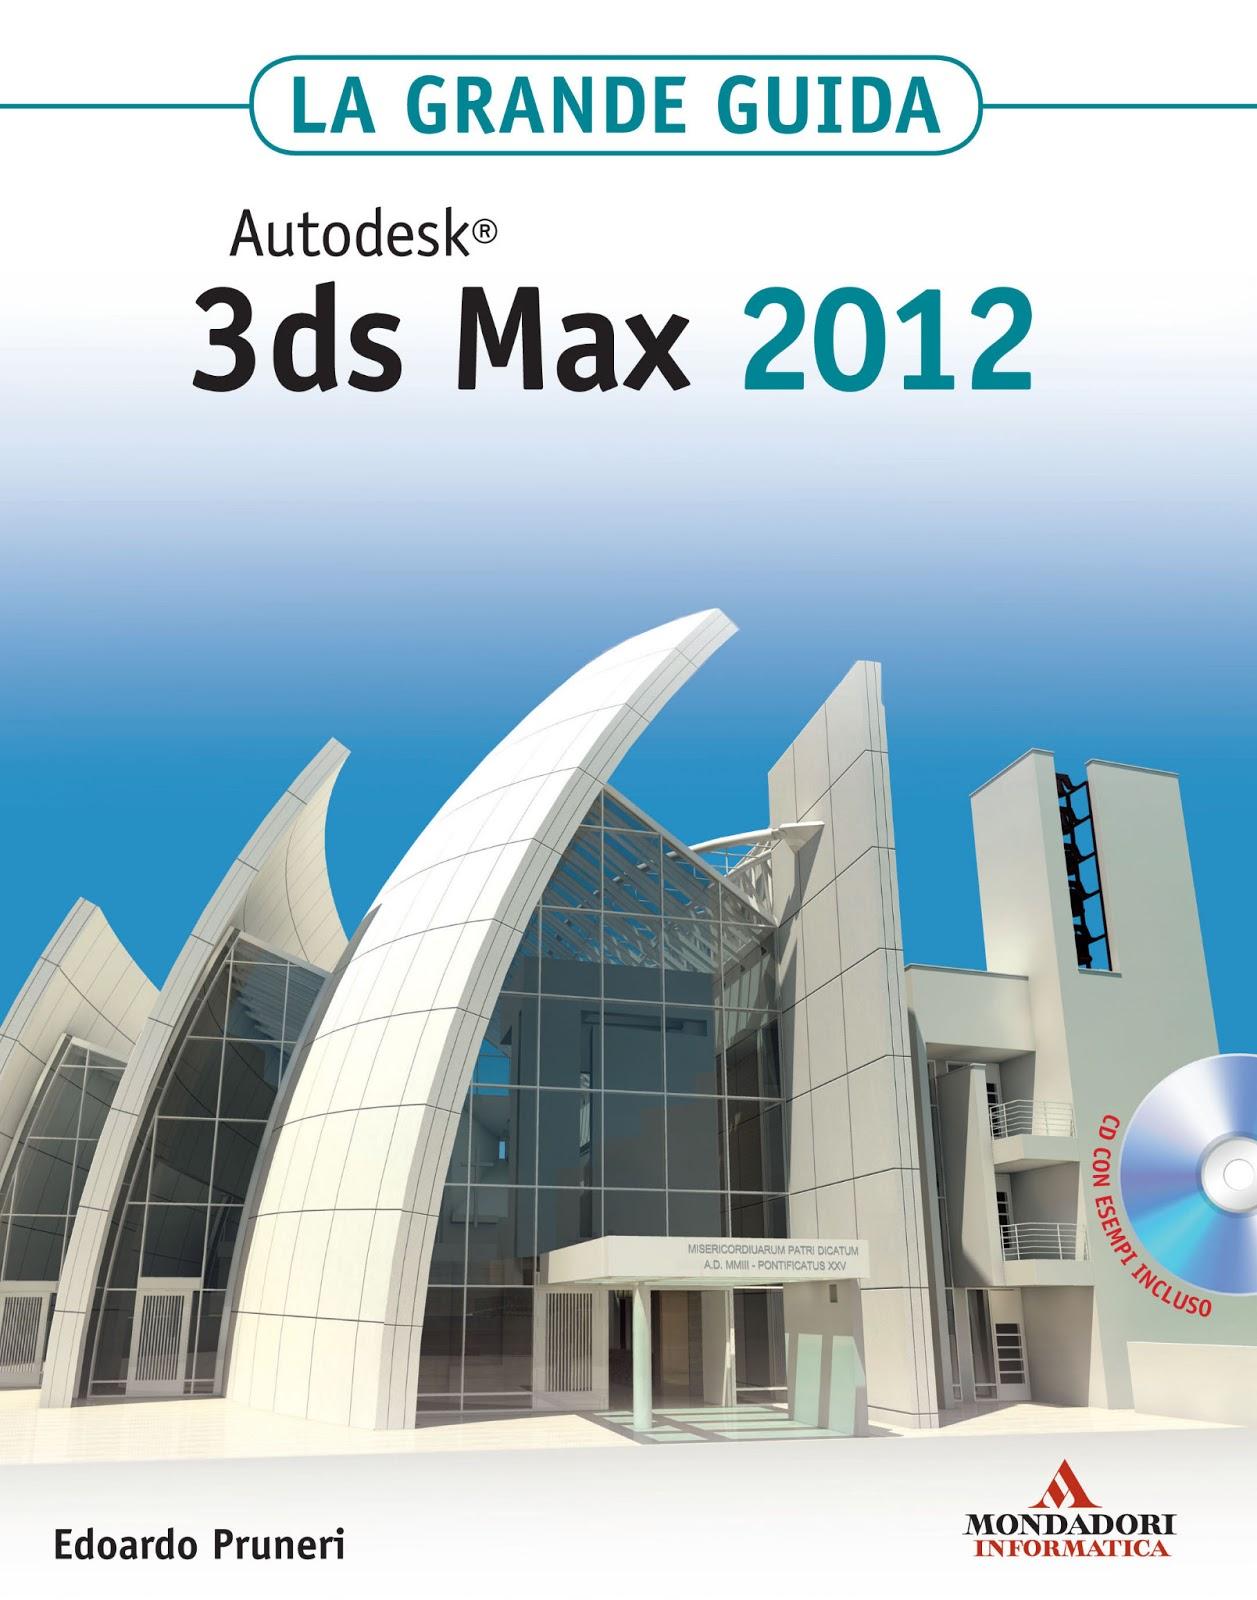 3d studio max 2012 full version free download download boat for 3d studio max torrent